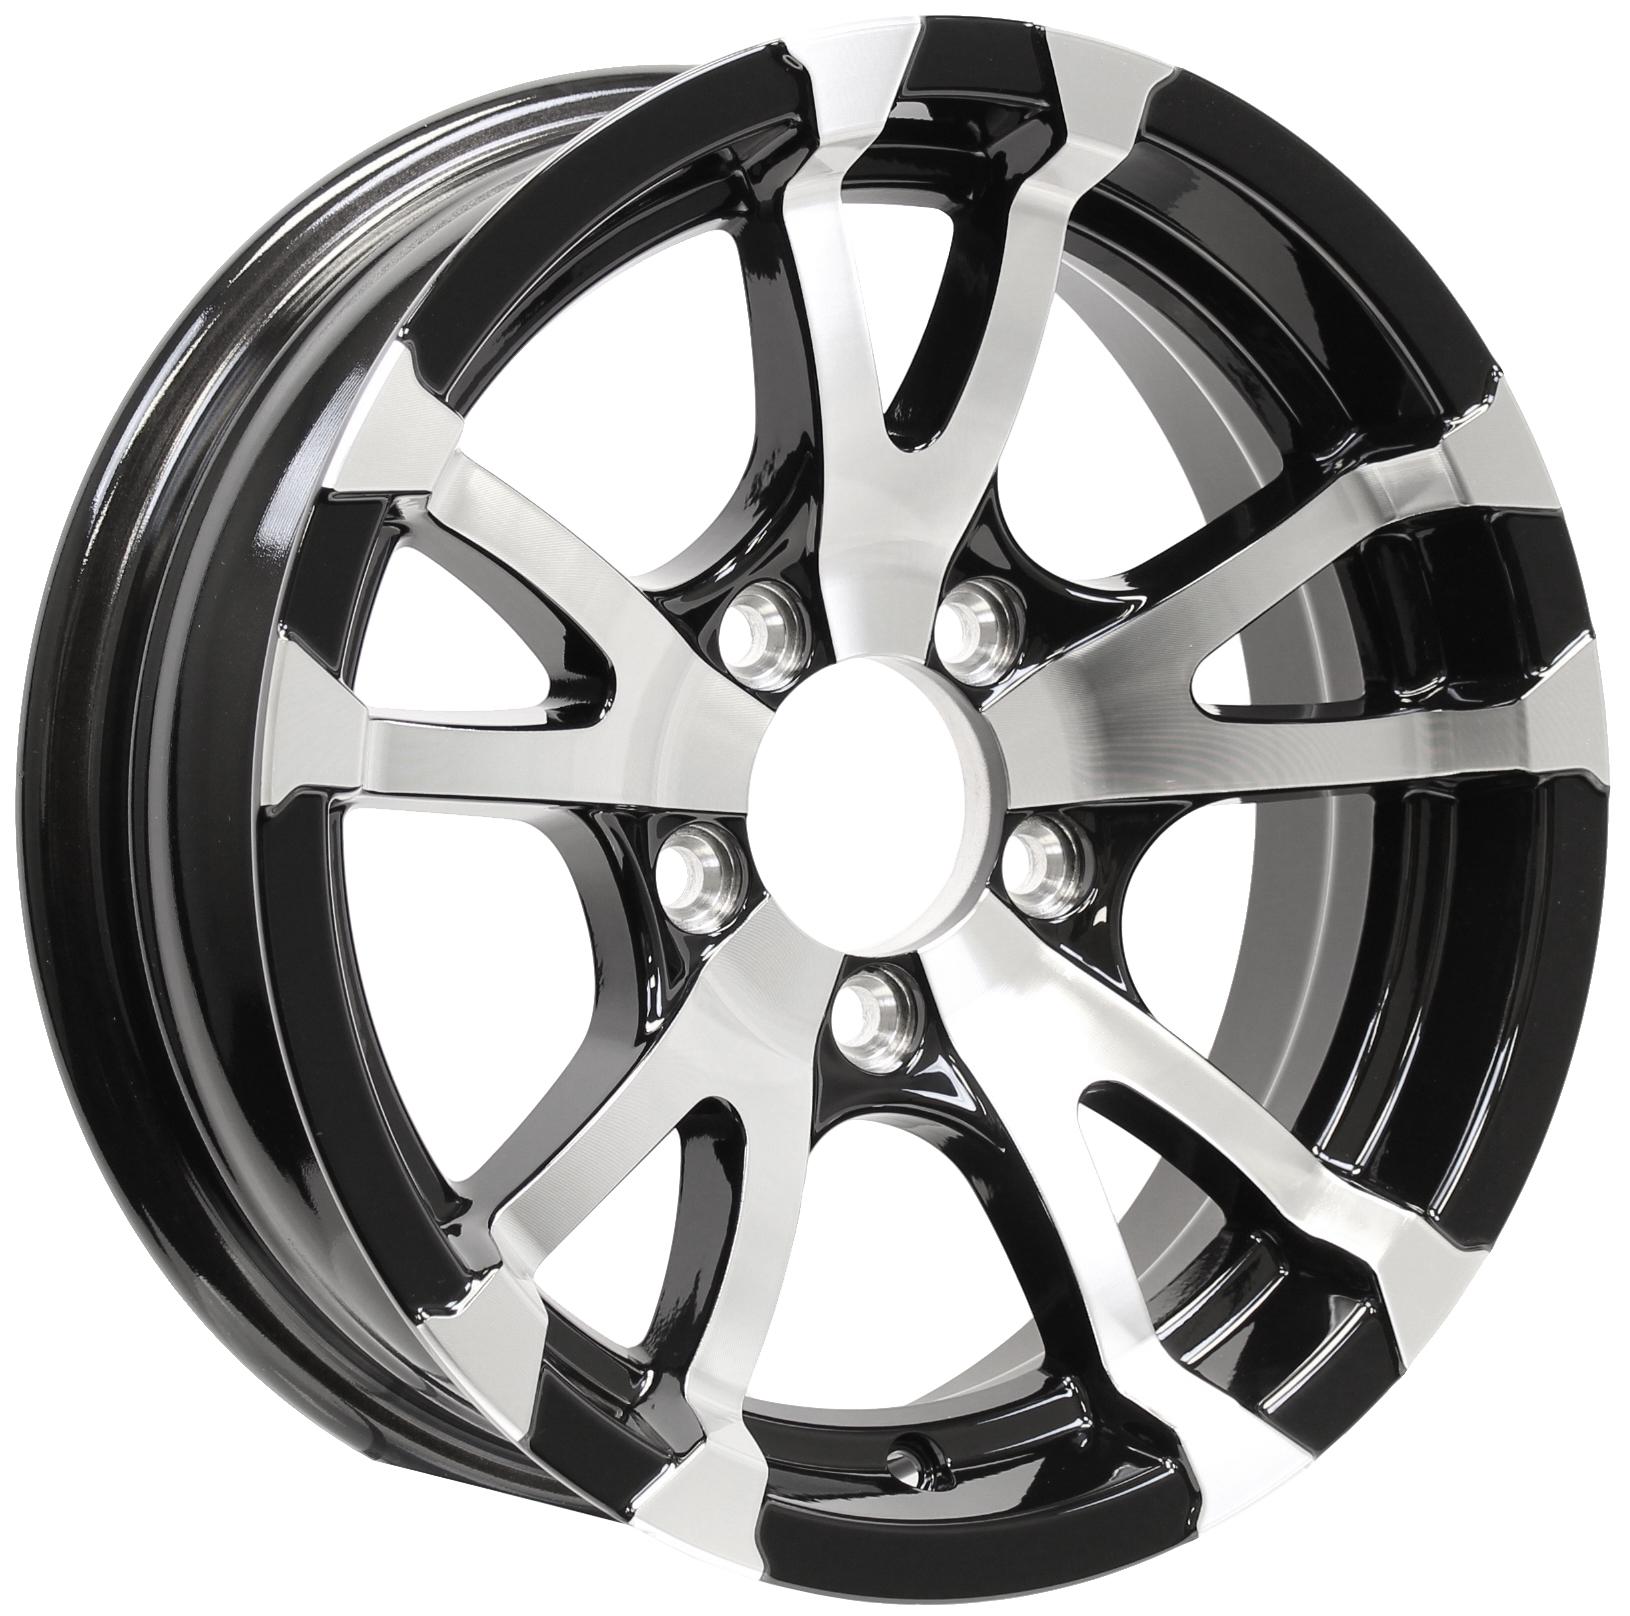 Avalanche 15x5 5-Lug Black Aluminum Trailer Wheel Image